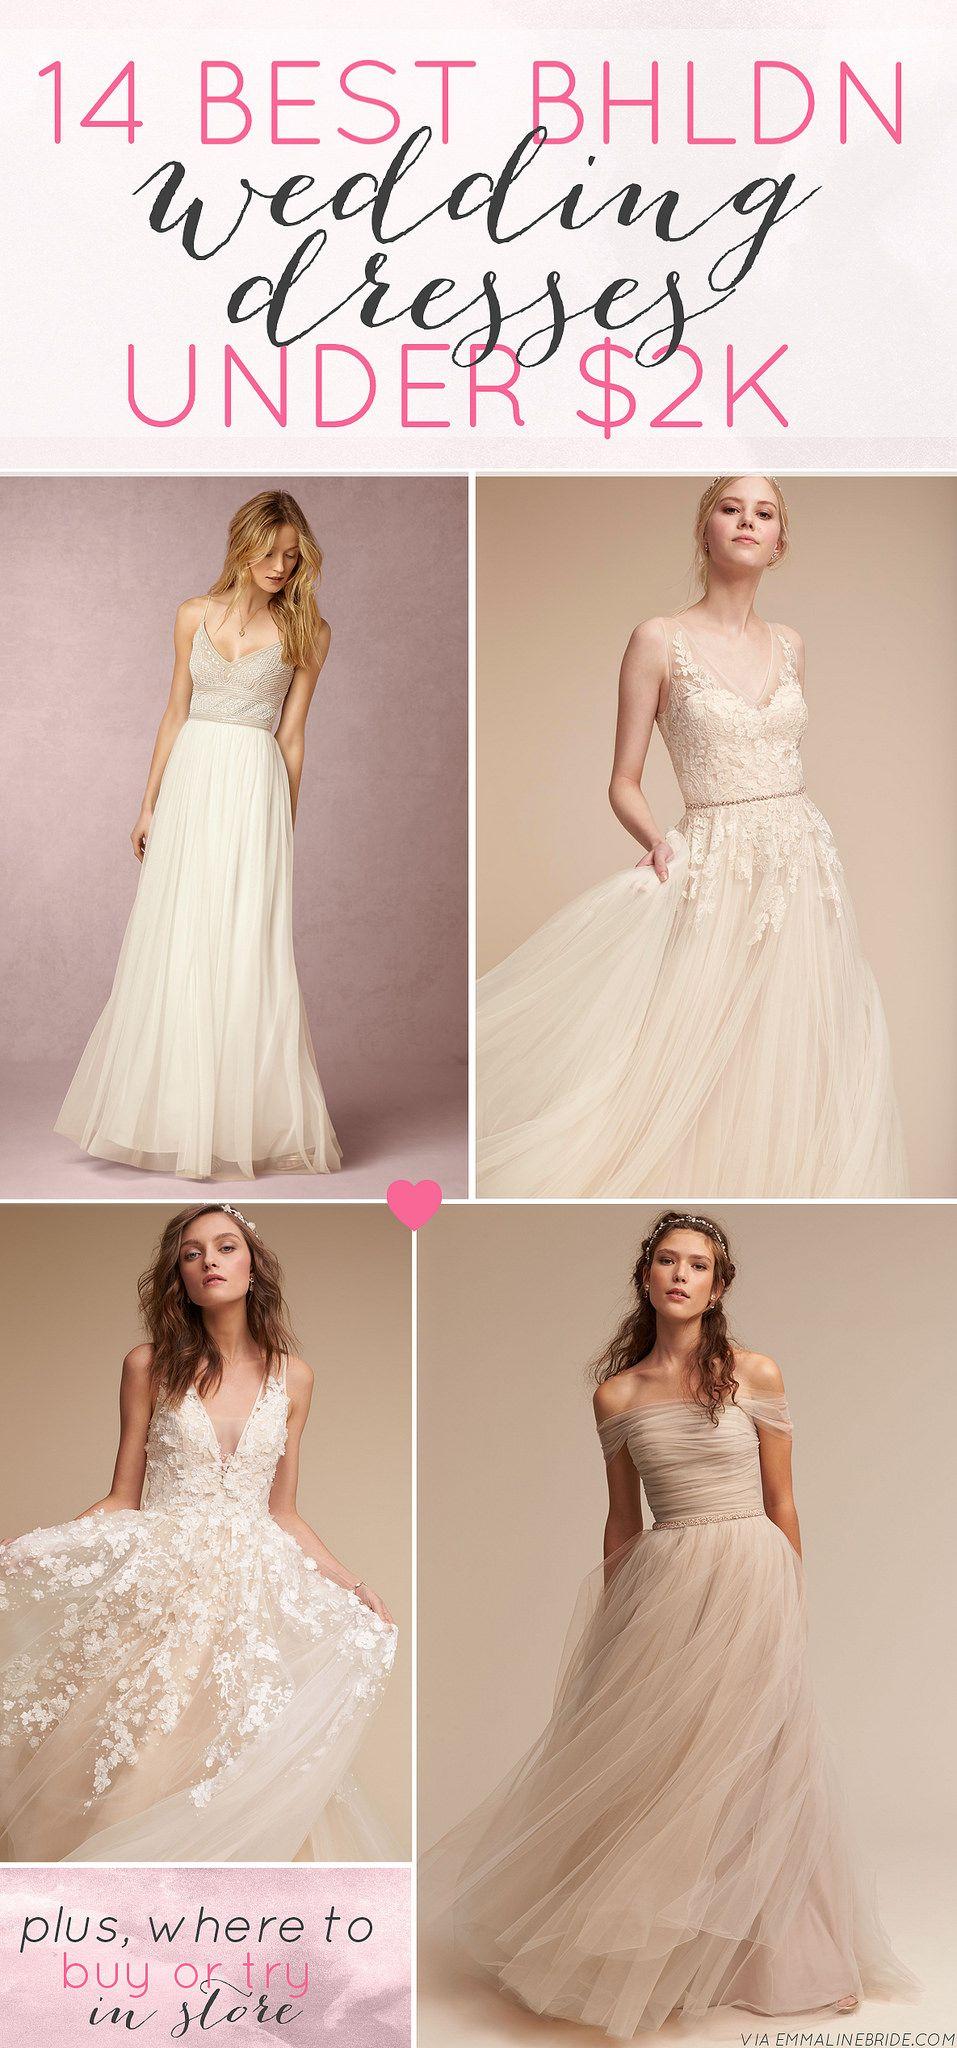 14 best bhldn wedding dresses anthropologie bhldn bhldnweddingdresses bhldnweddings. Black Bedroom Furniture Sets. Home Design Ideas